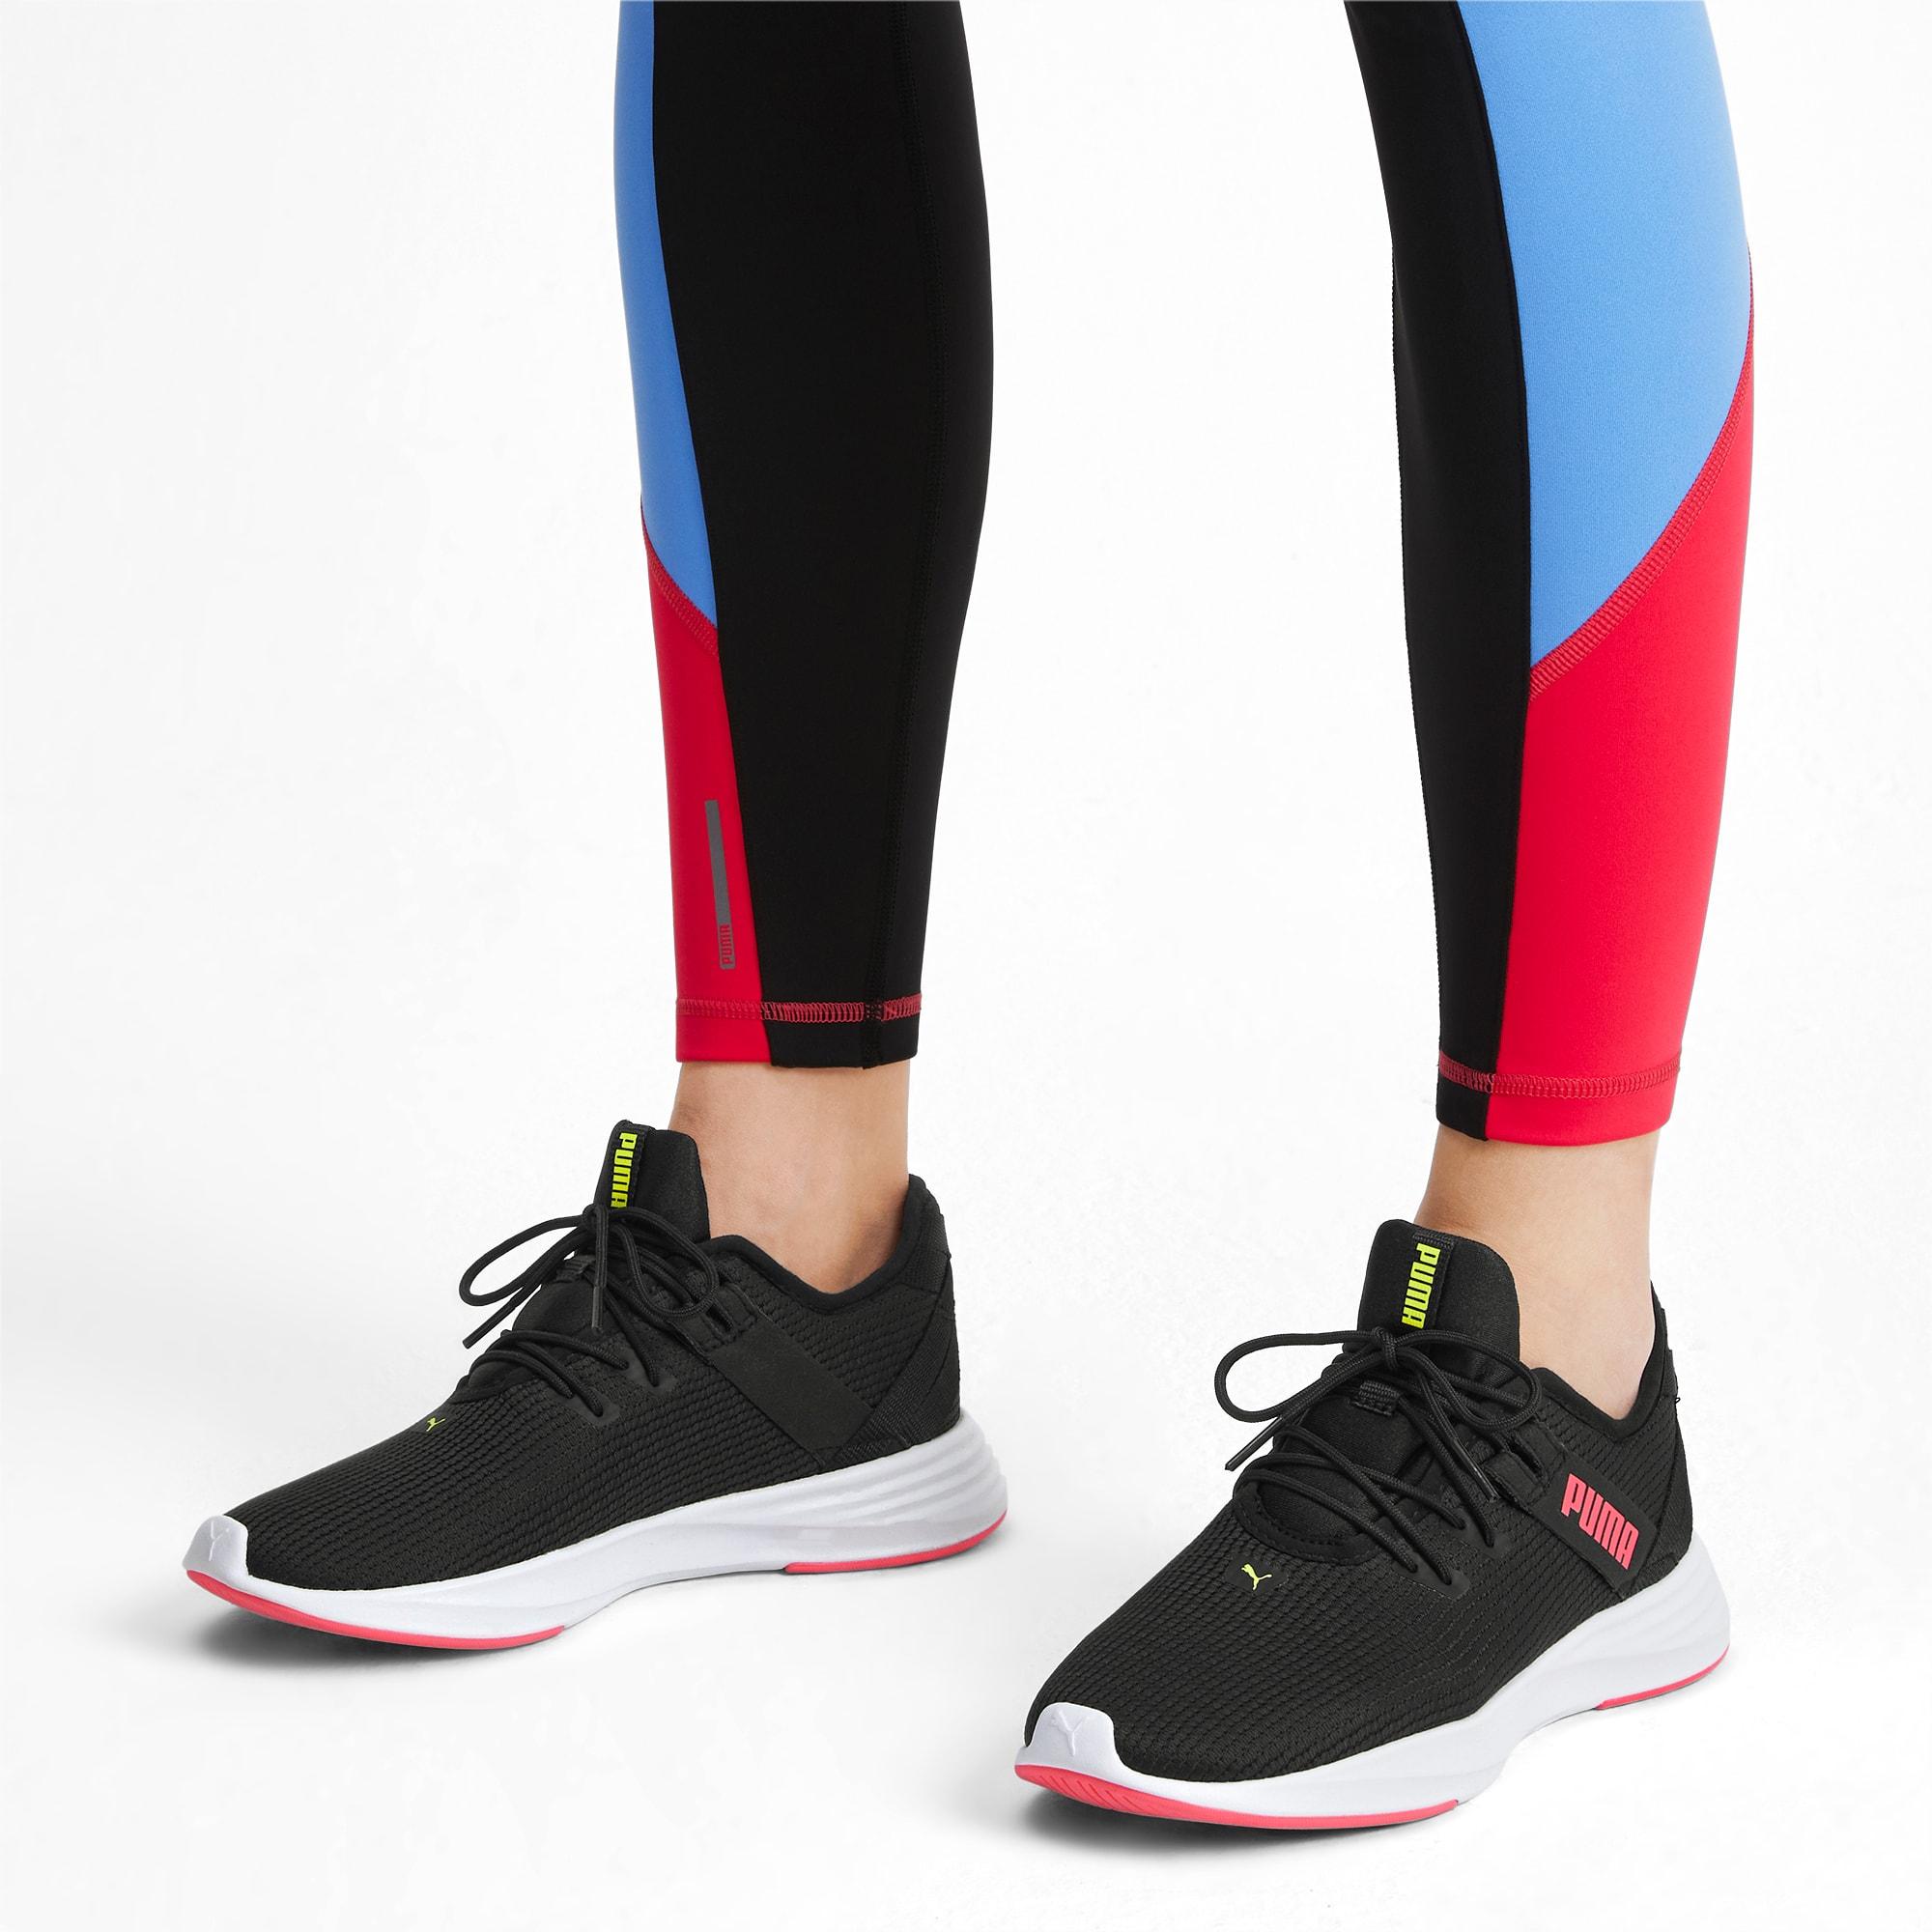 Radiate XT Women's Training Shoes